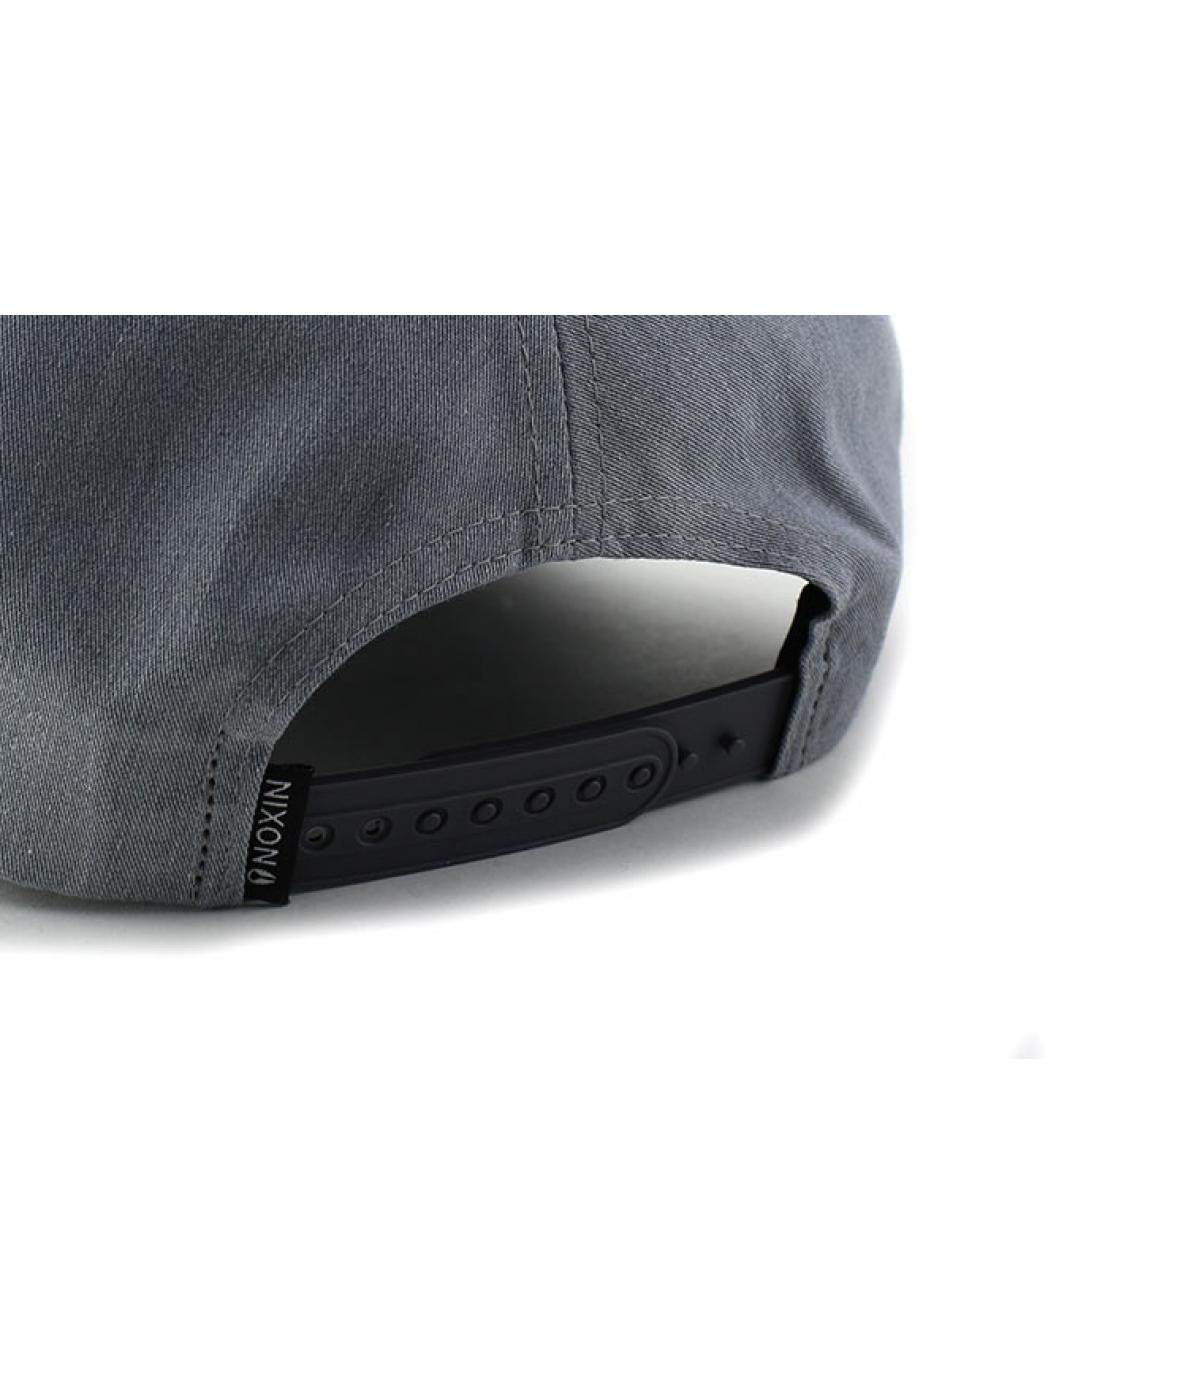 Détails Lockup heather grey - image 5